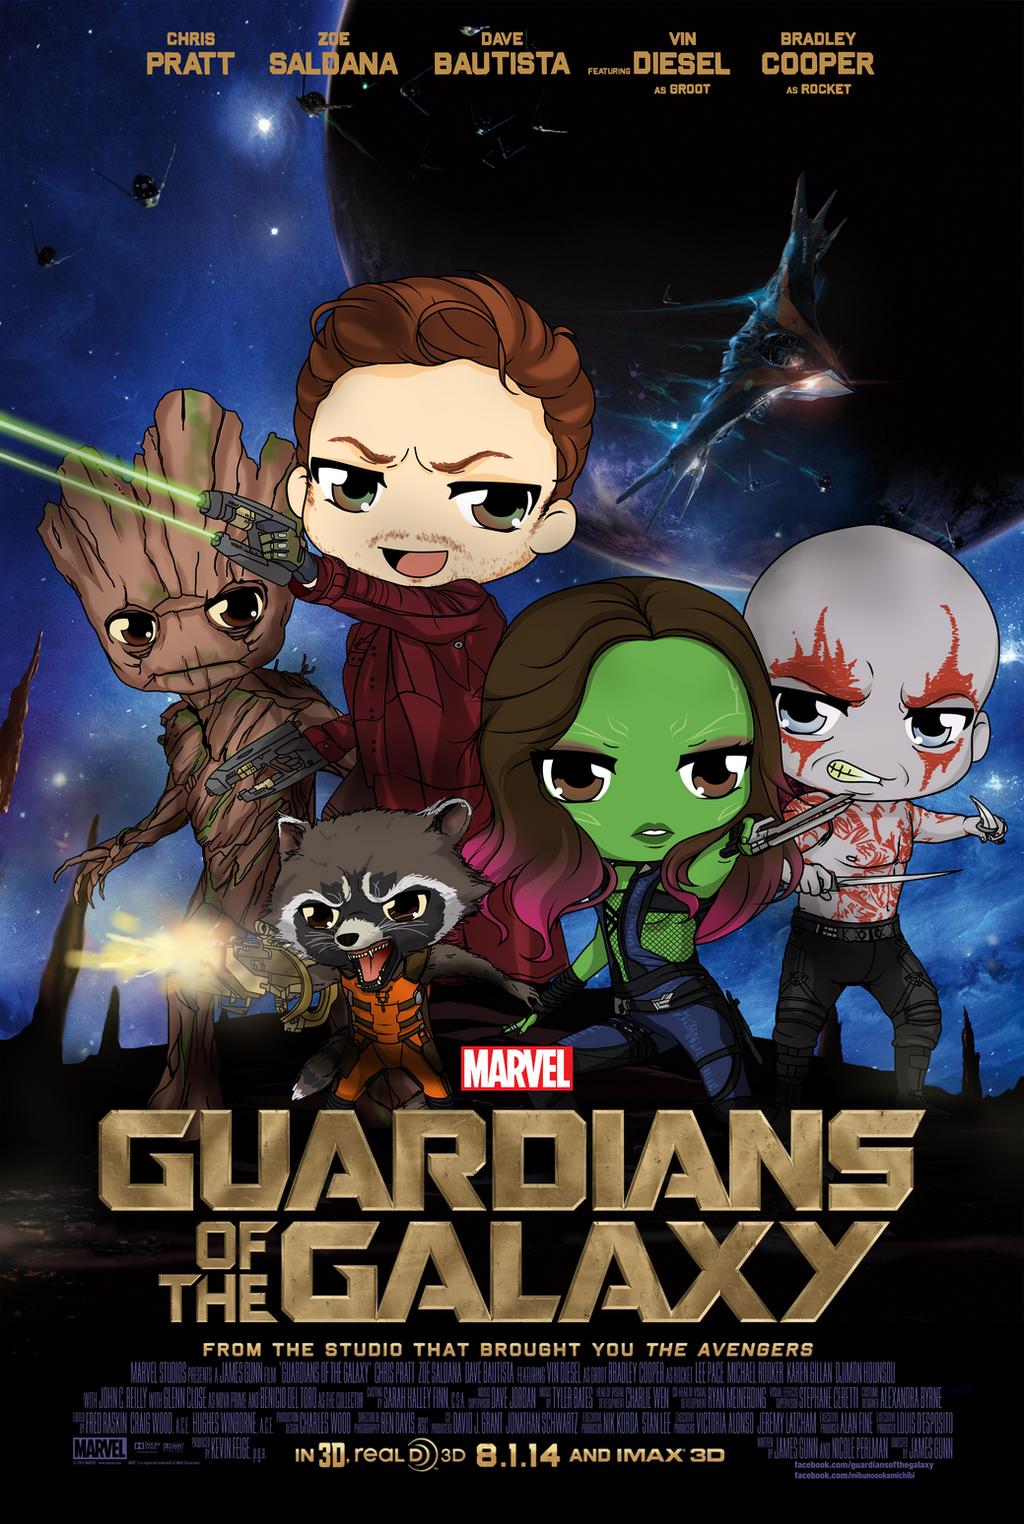 Guardians Of The Gallaxy - Chibi Poster by Mibu-no-ookami